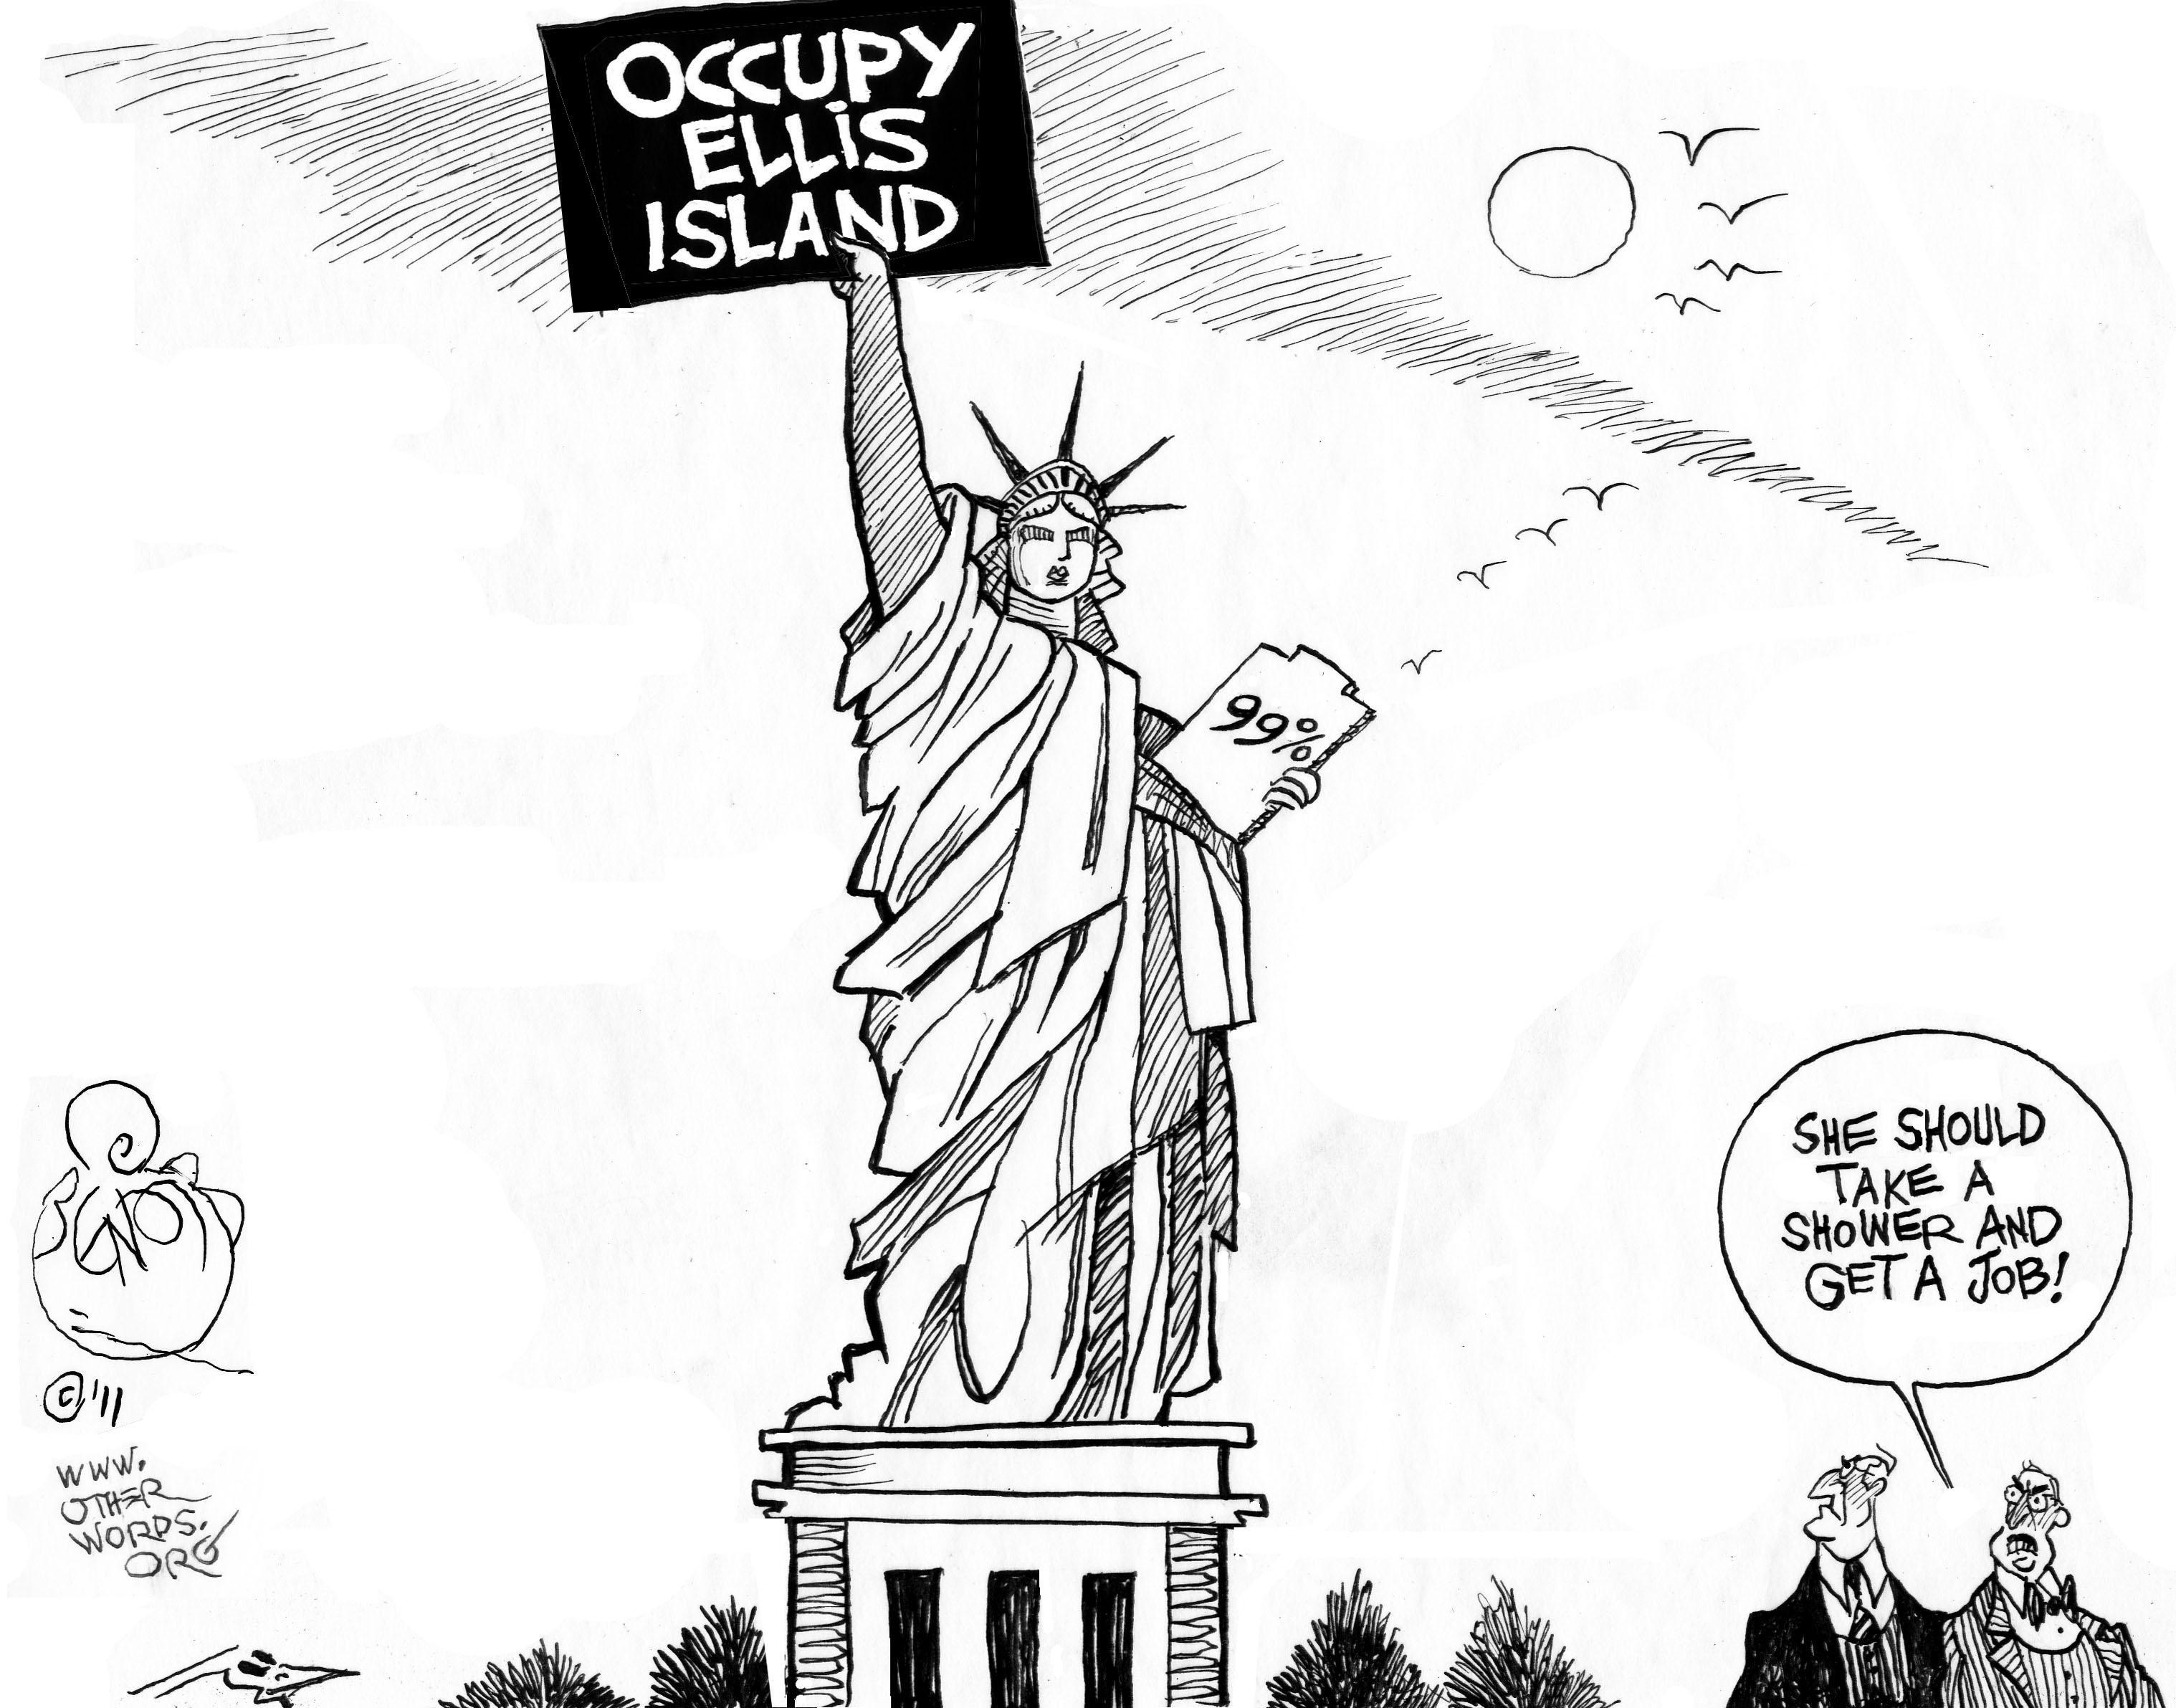 Occupy Ellis Island